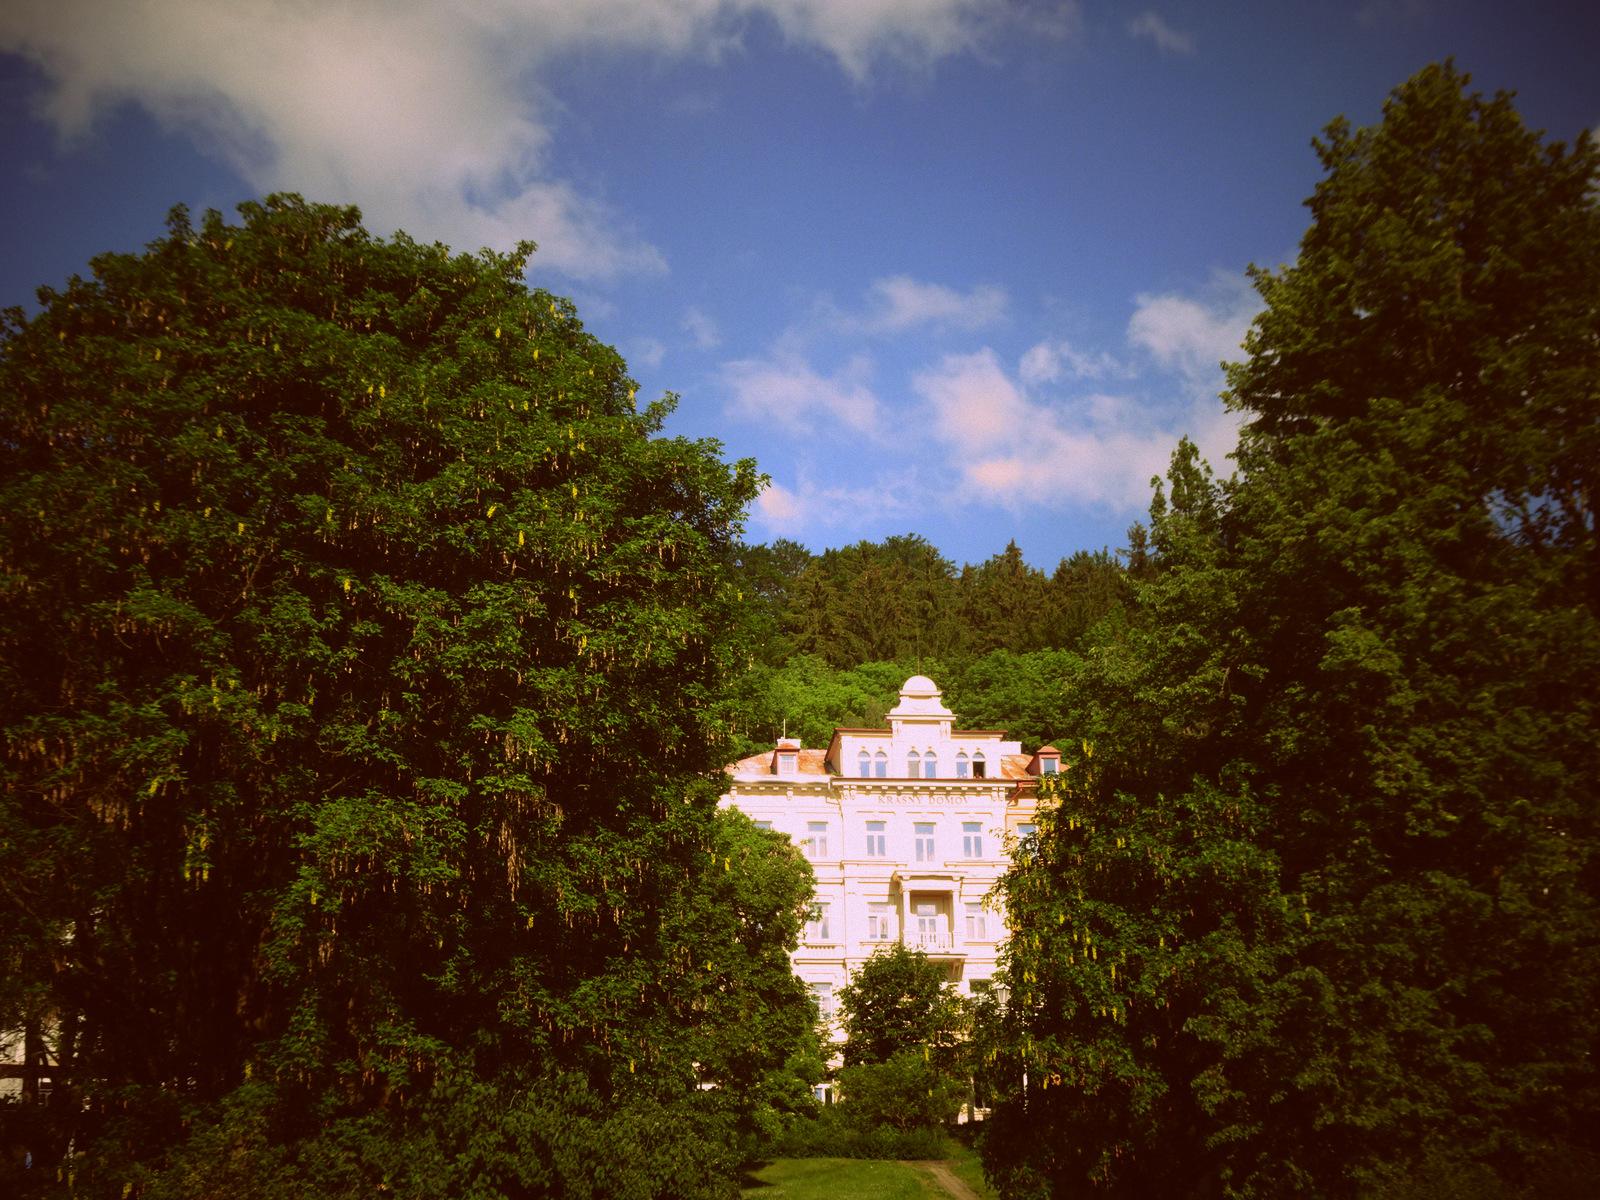 Haus grün 1